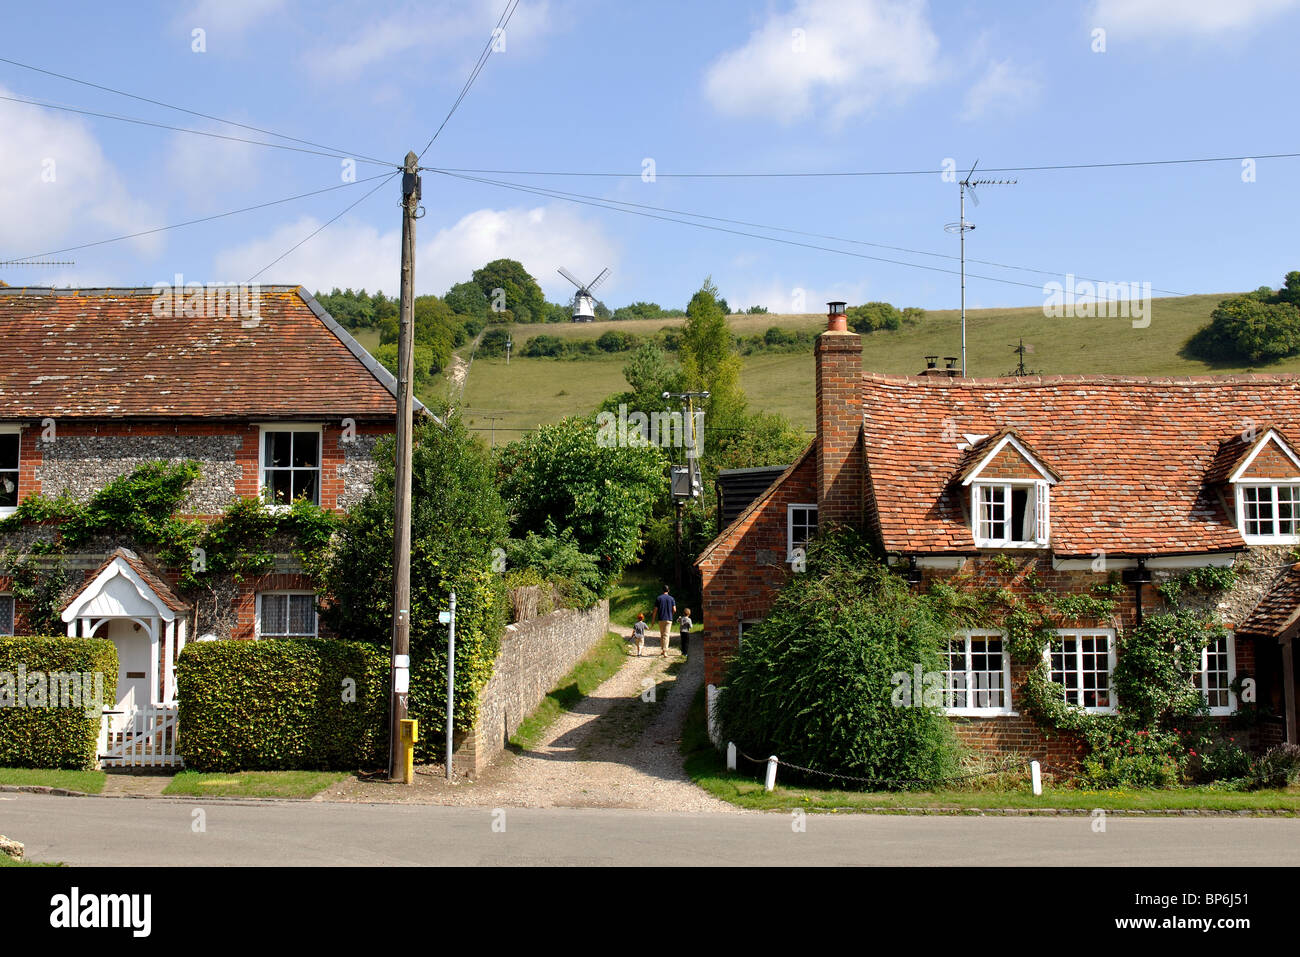 Turville village looking towards the windmill, Buckinghamshire, England, UK - Stock Image